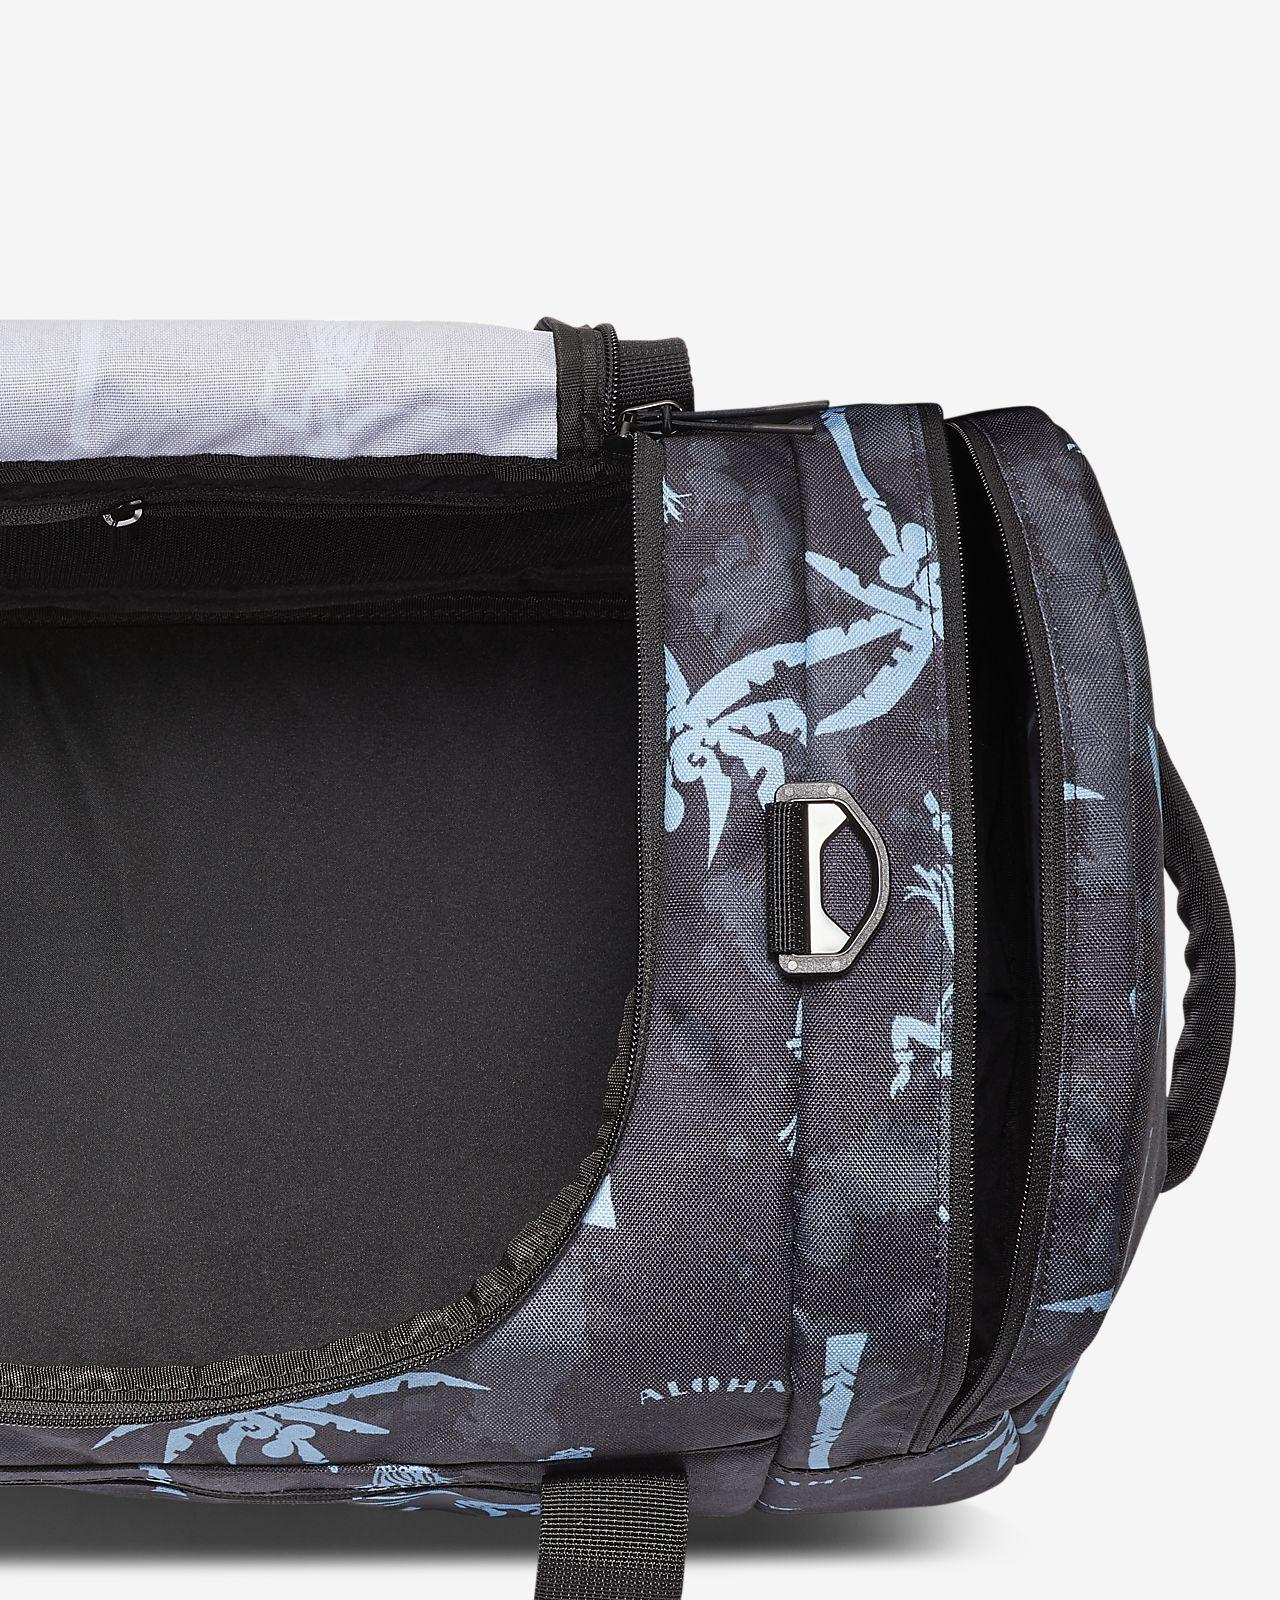 c3933f4038f866 Hurley Renegade 2 Aloha Only Unisex Duffel Bag. Nike.com ZA